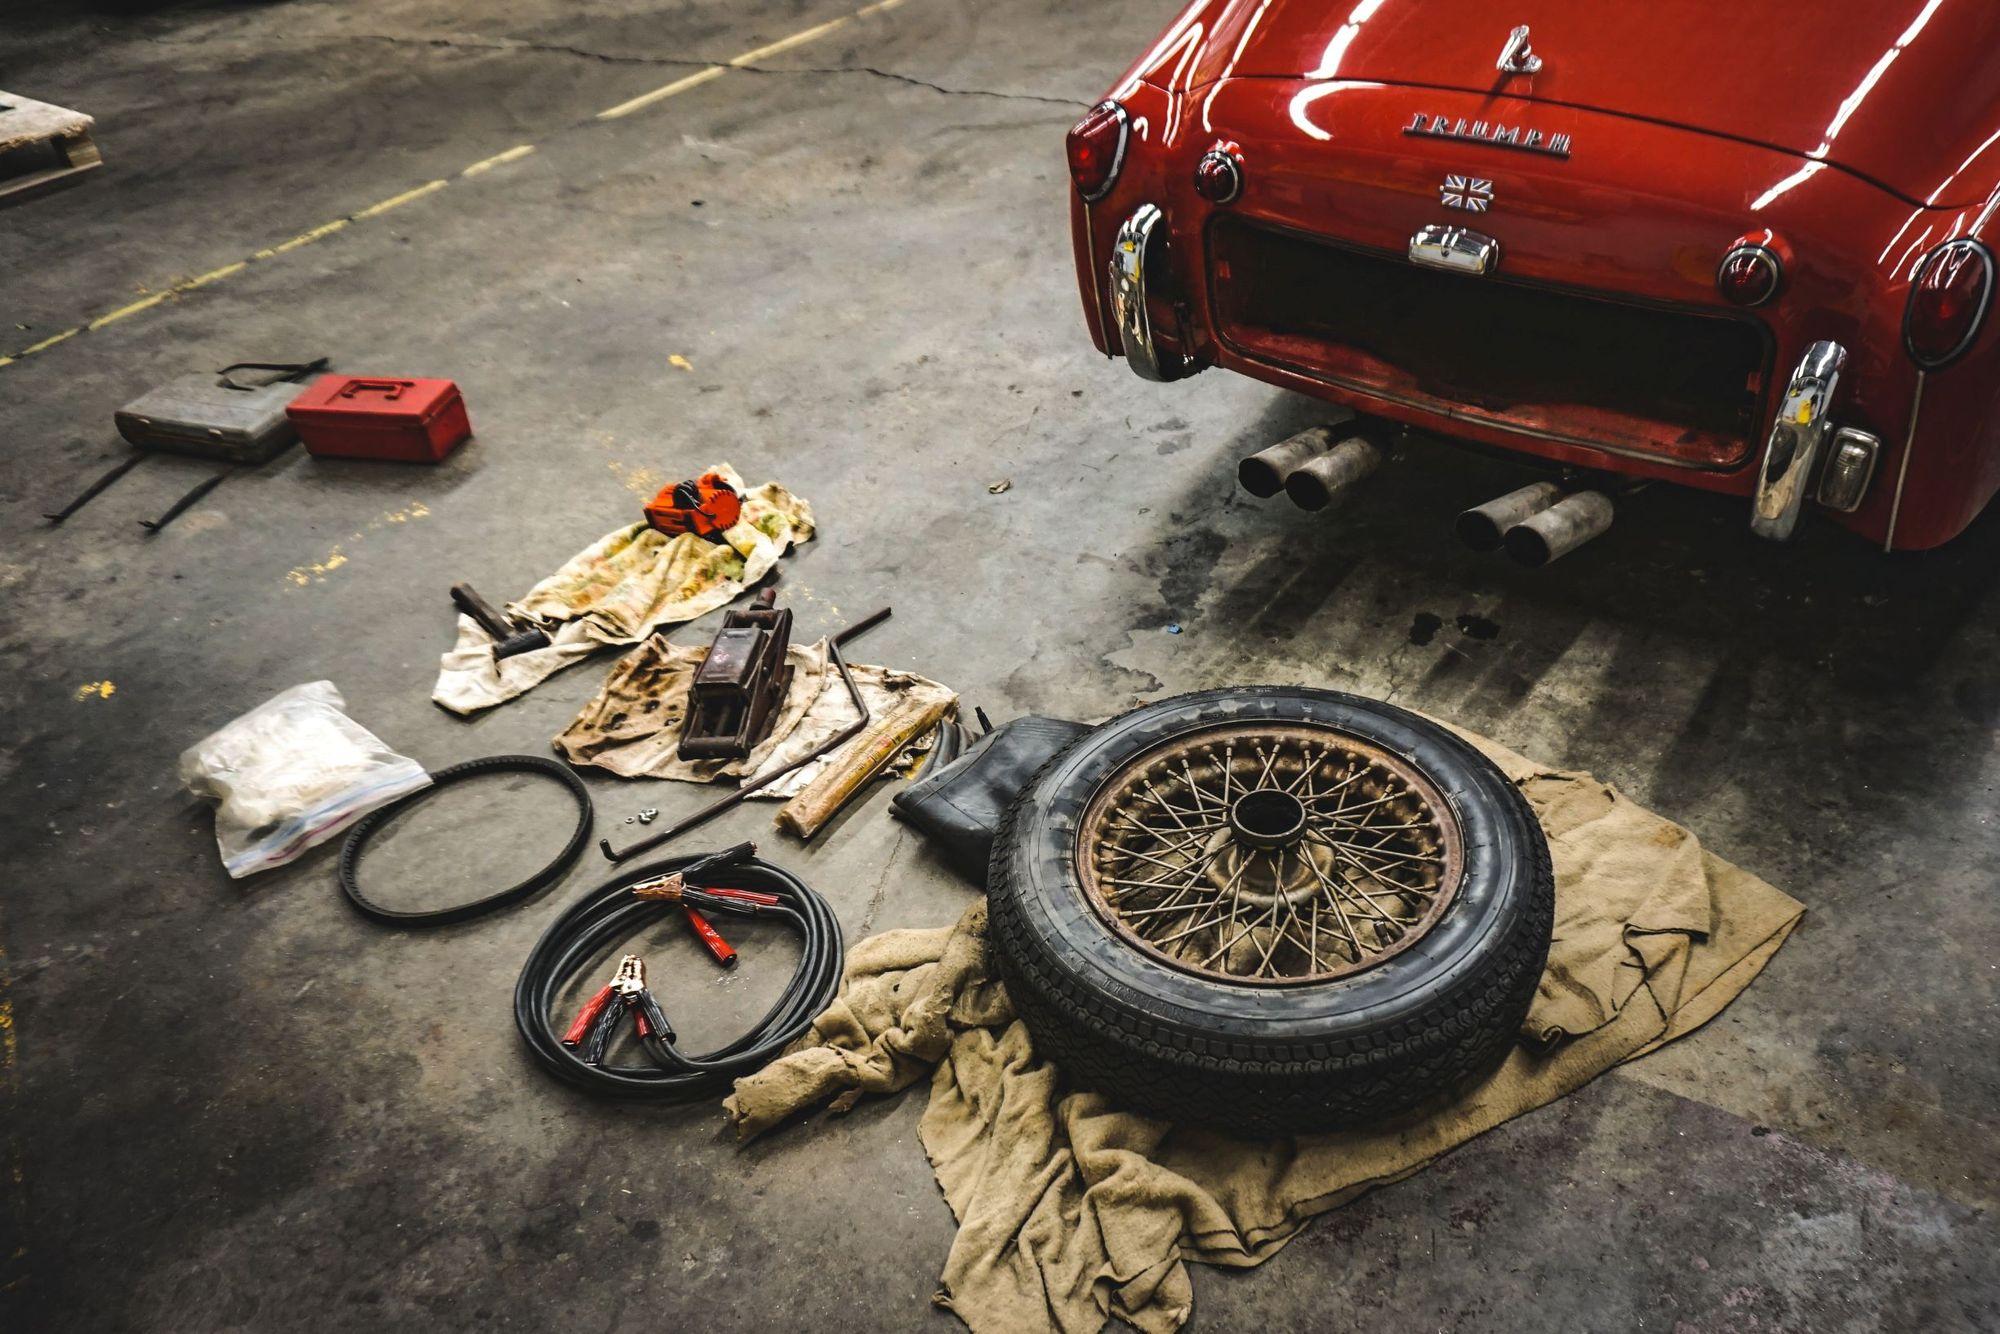 Photo of a car disassembled at a mechanic's repair shop